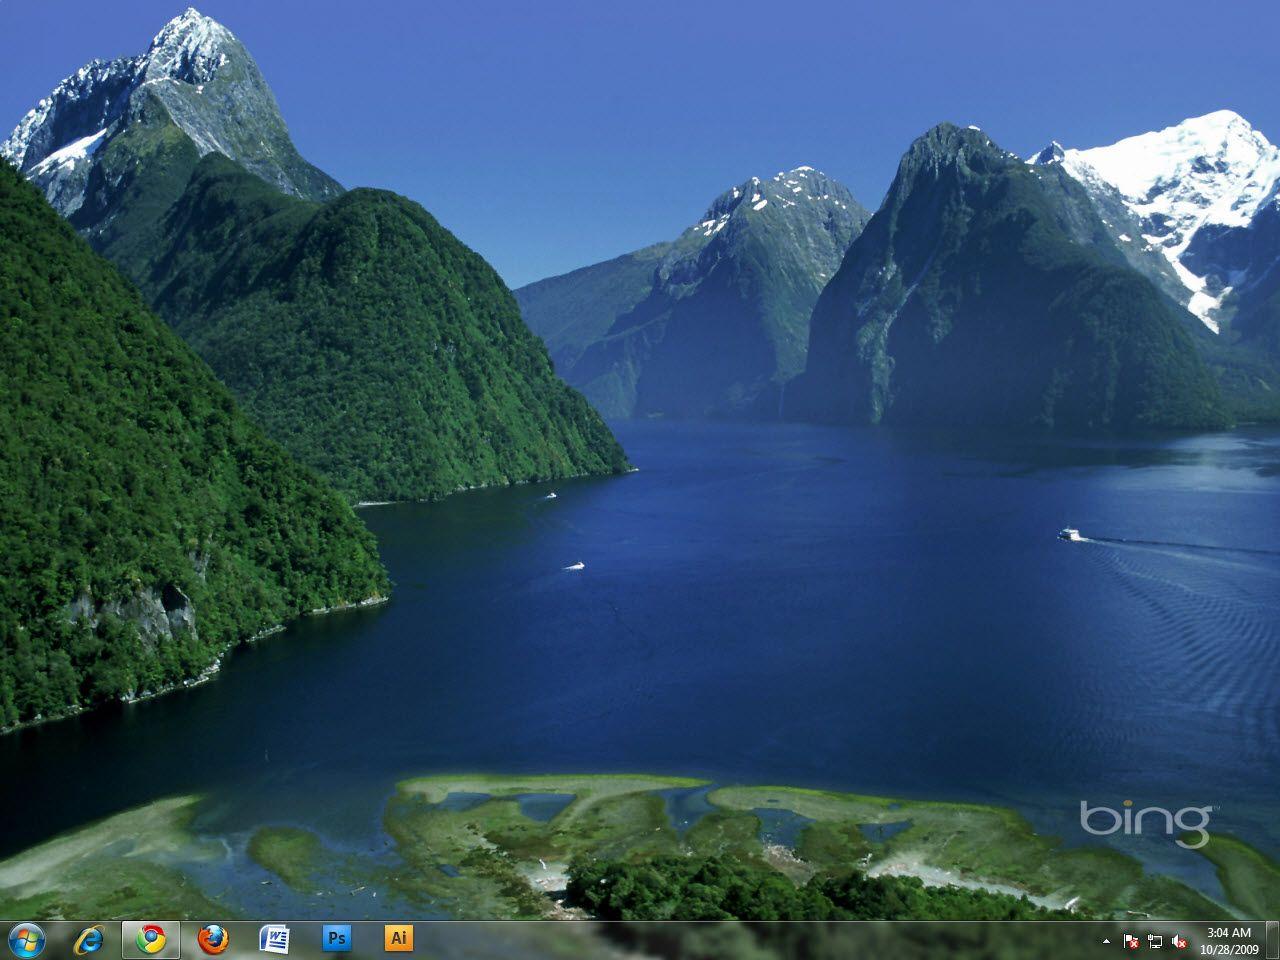 Windows 7 Themes windows 7 themes Desktop Backgrounds